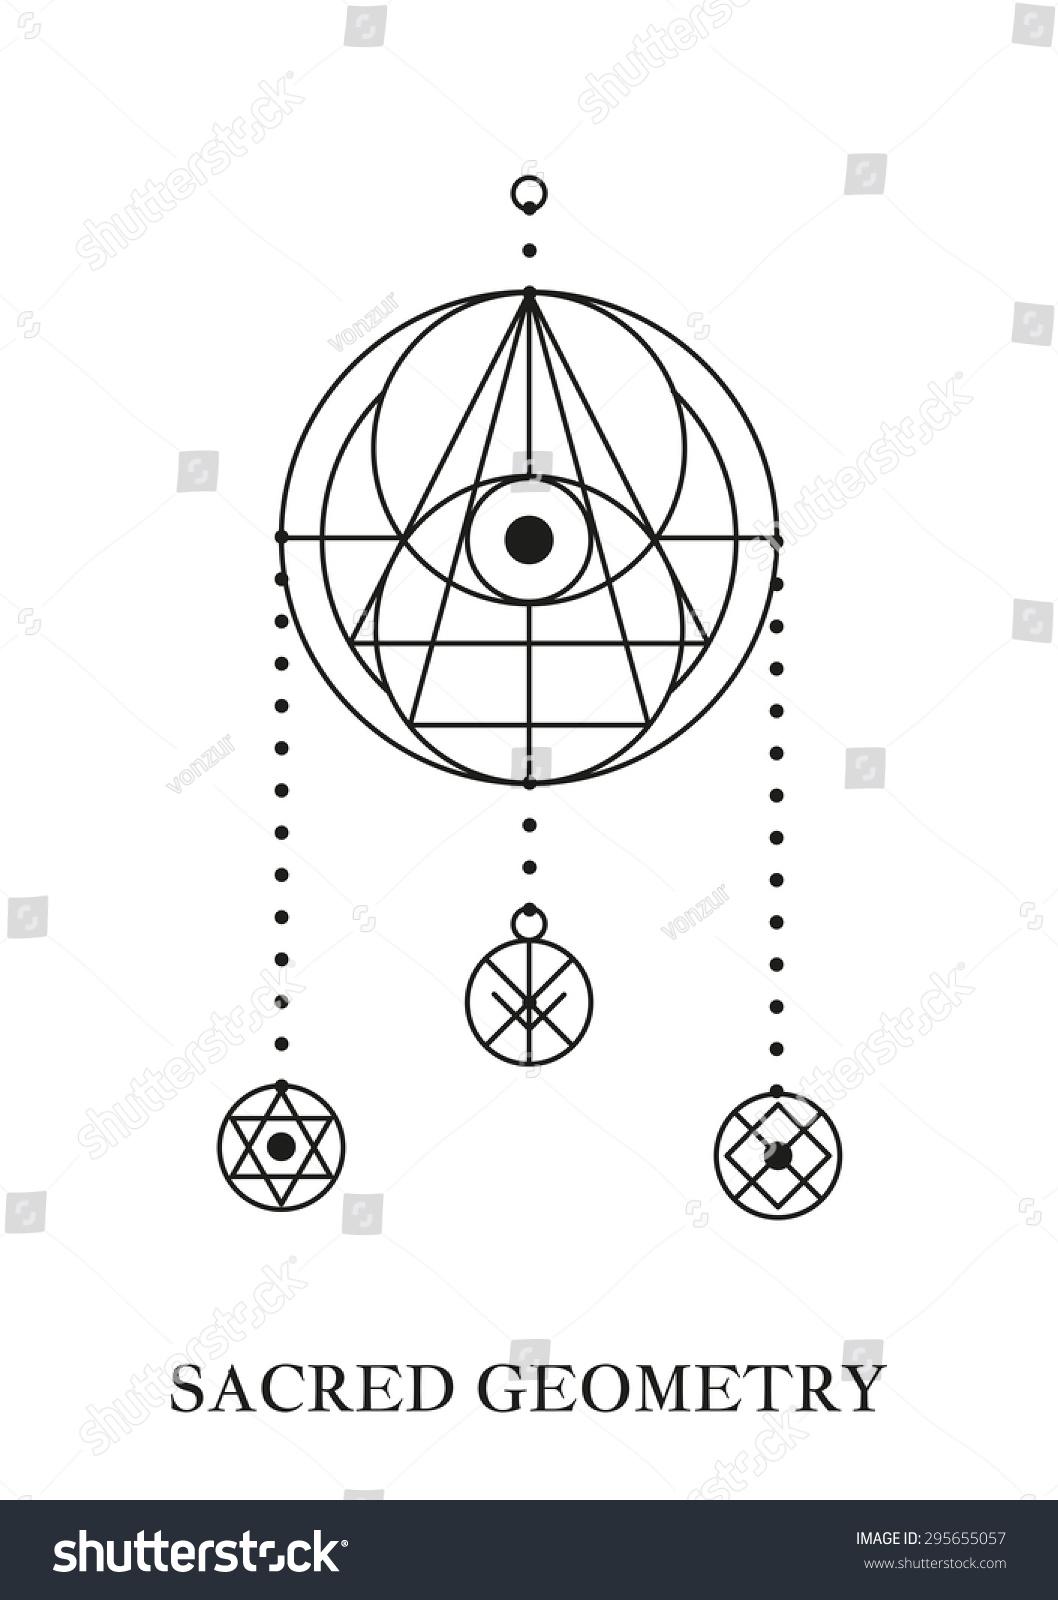 Magic eye tantric buddhism symbol alchemy stock vector 295655057 magic eye tantric buddhism symbol alchemy religion spirituality occultism tattoo biocorpaavc Images